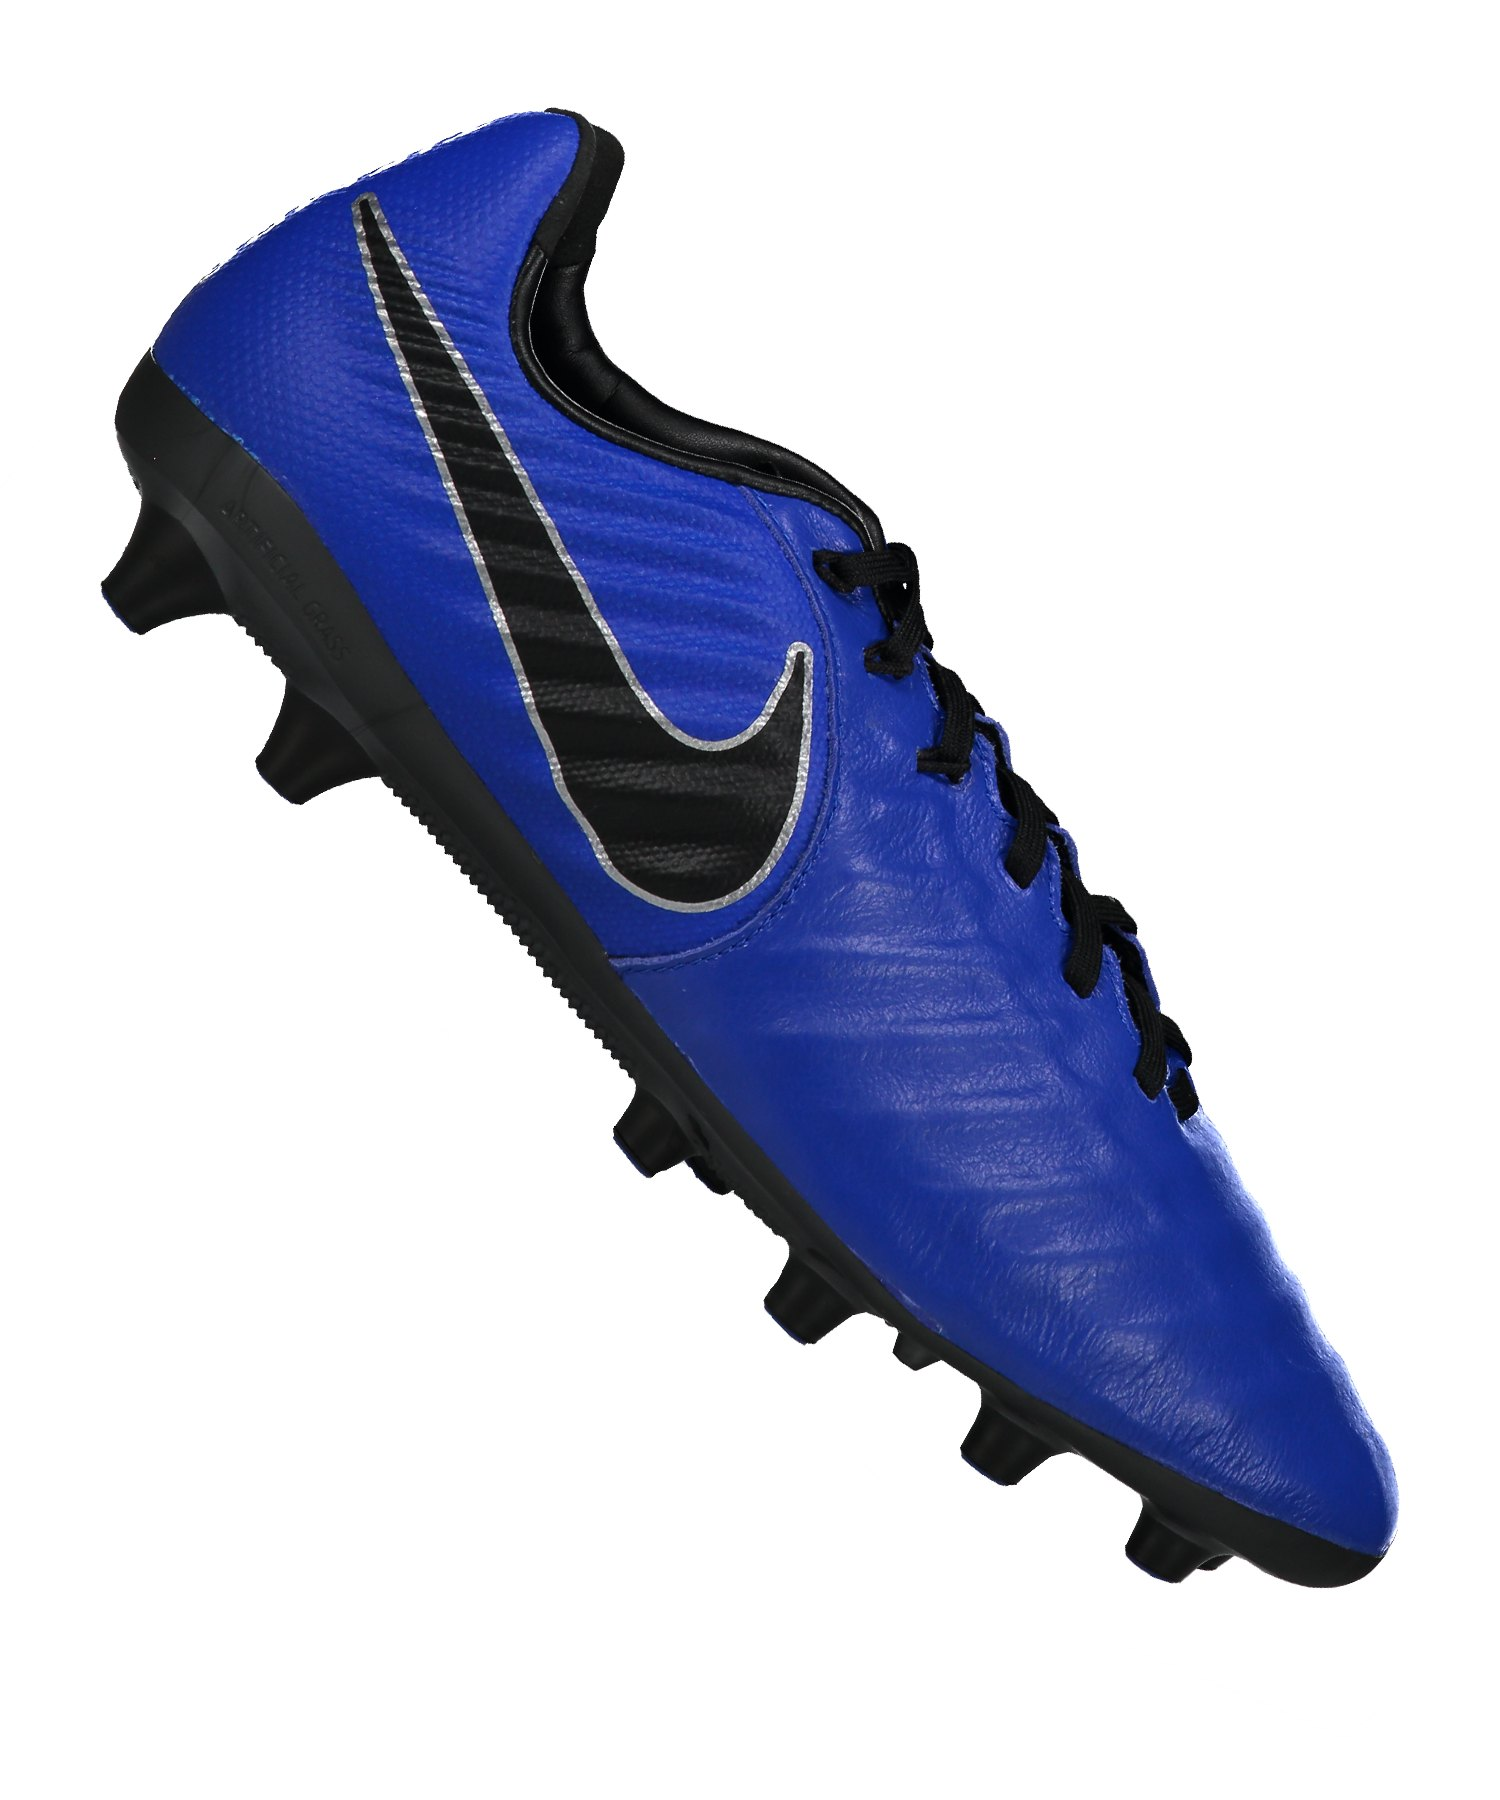 Nike Tiempo Legend VII Pro AG-Pro Blau F400 - blau